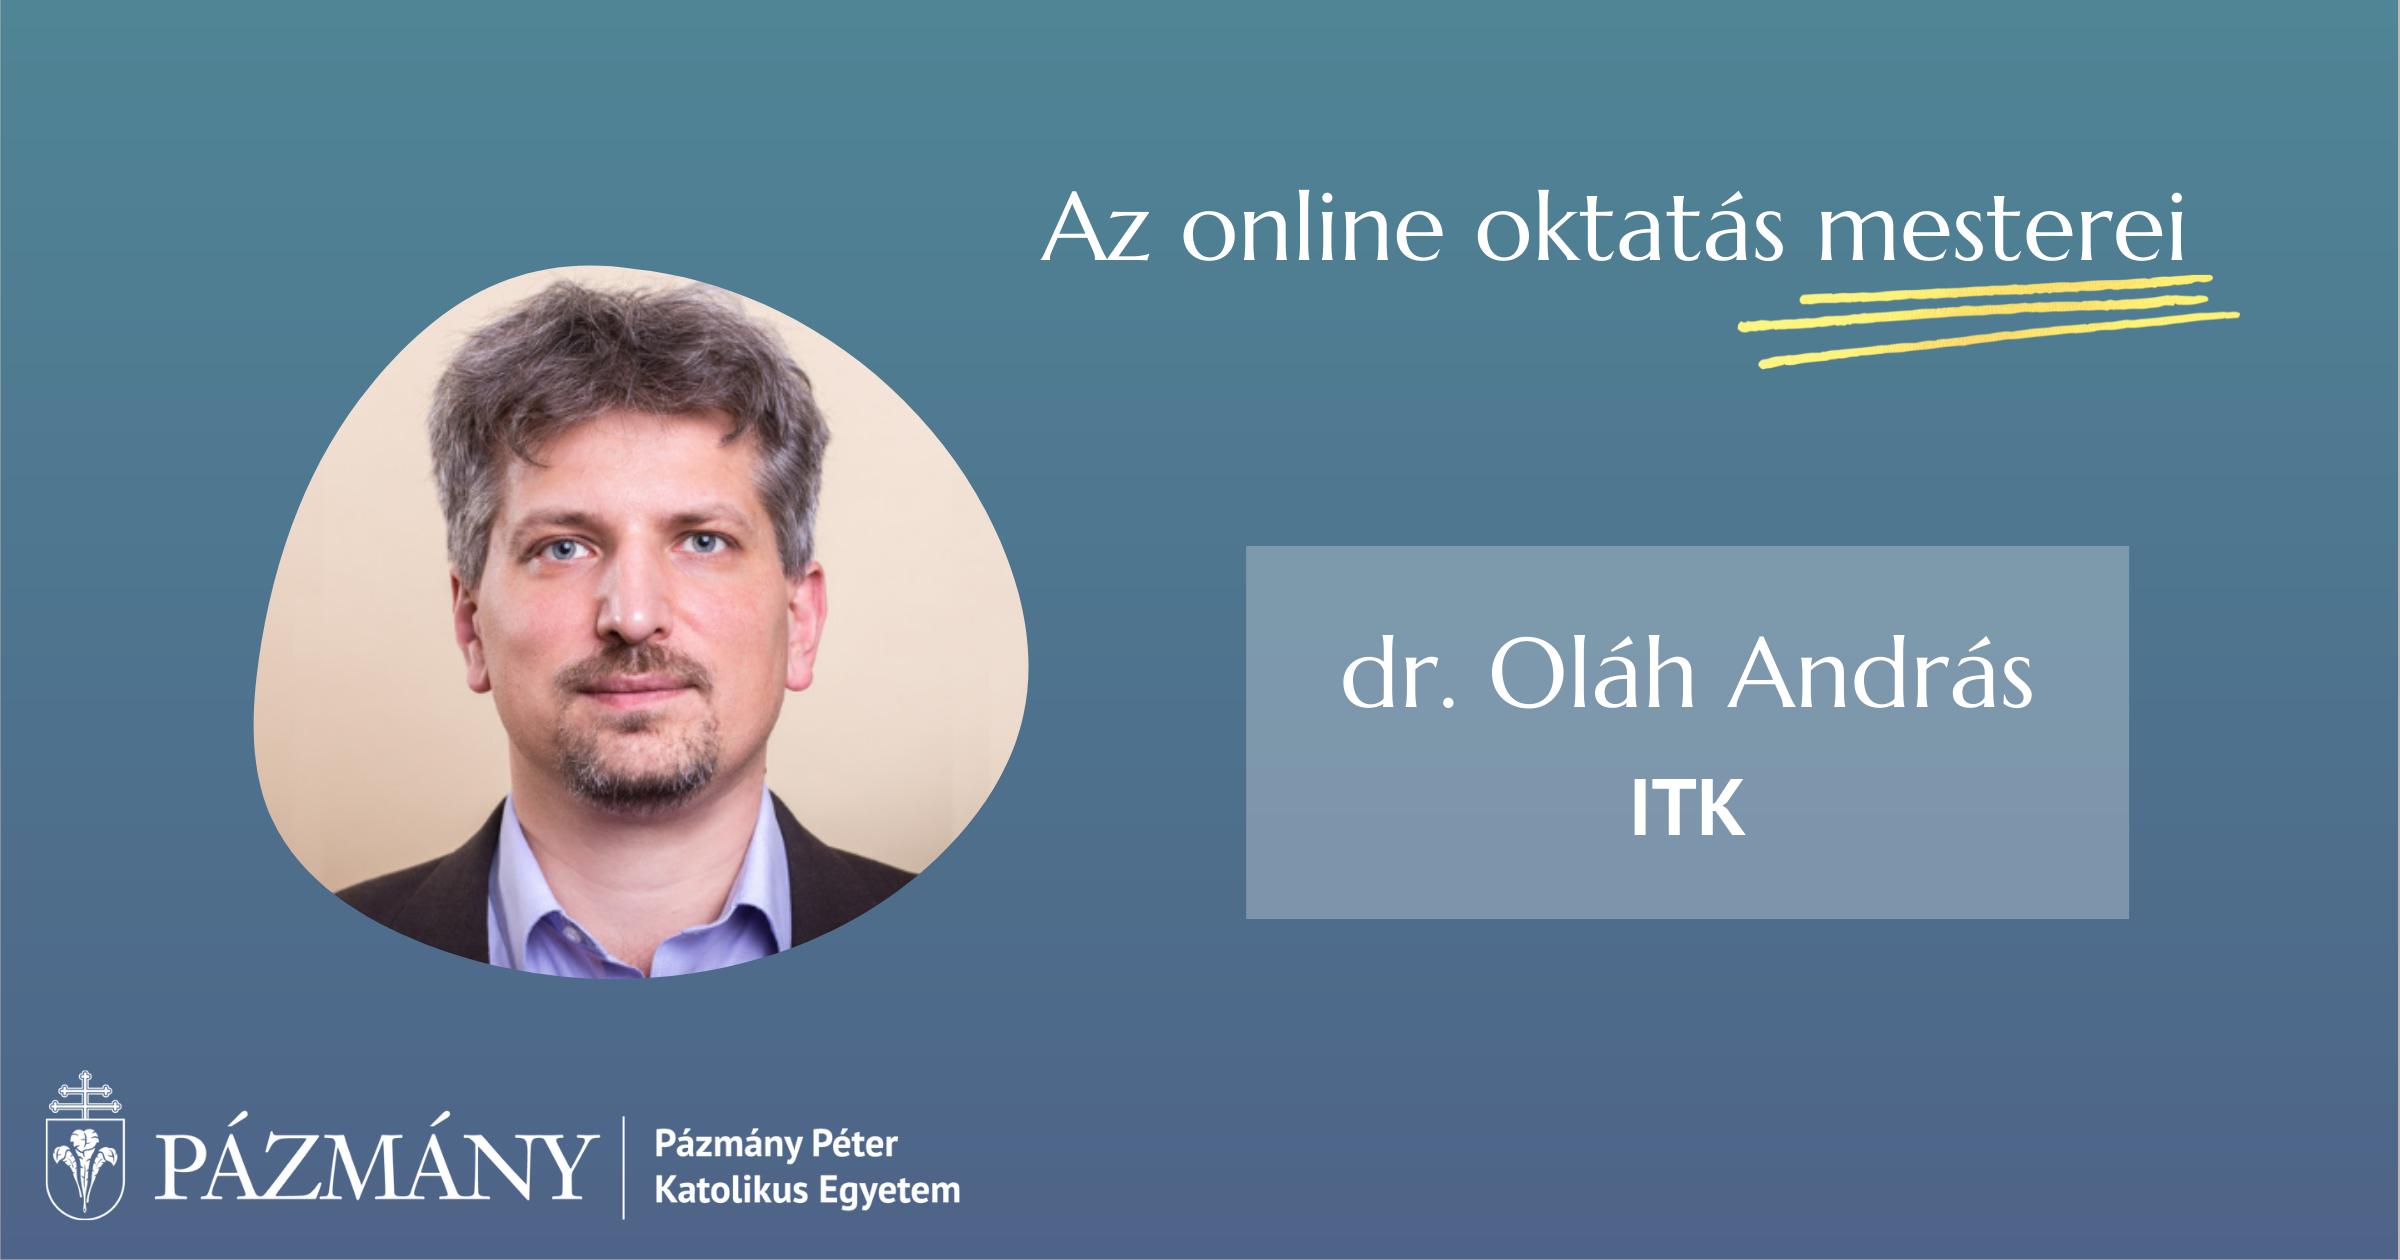 az_online_oktatas_mesterei_olah_andras.png